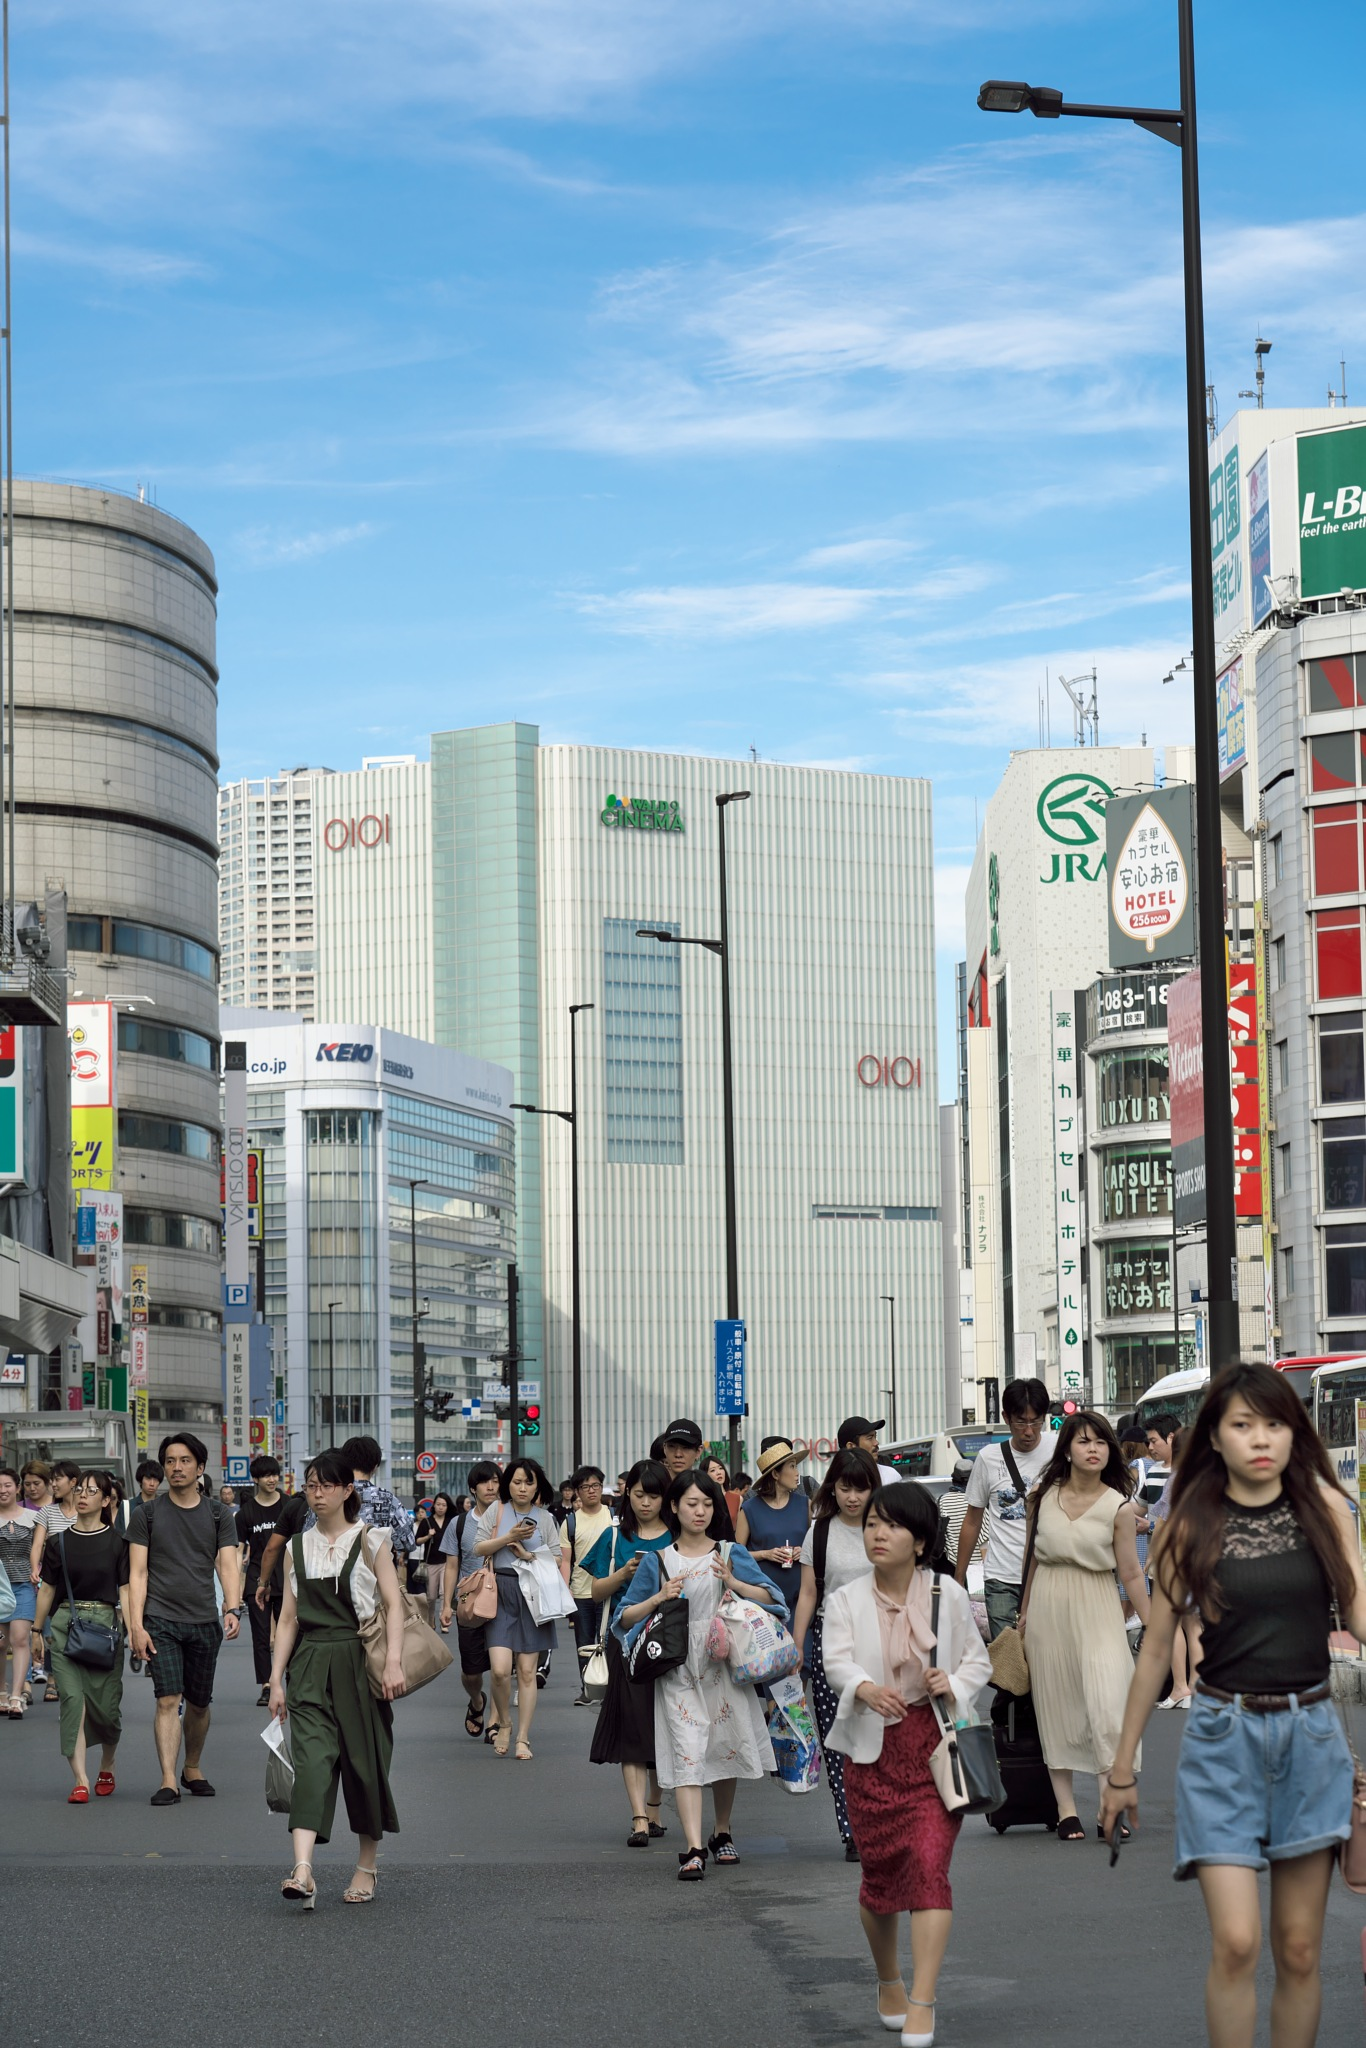 Tokyo/Shinjuku by Peter_Ohsaki